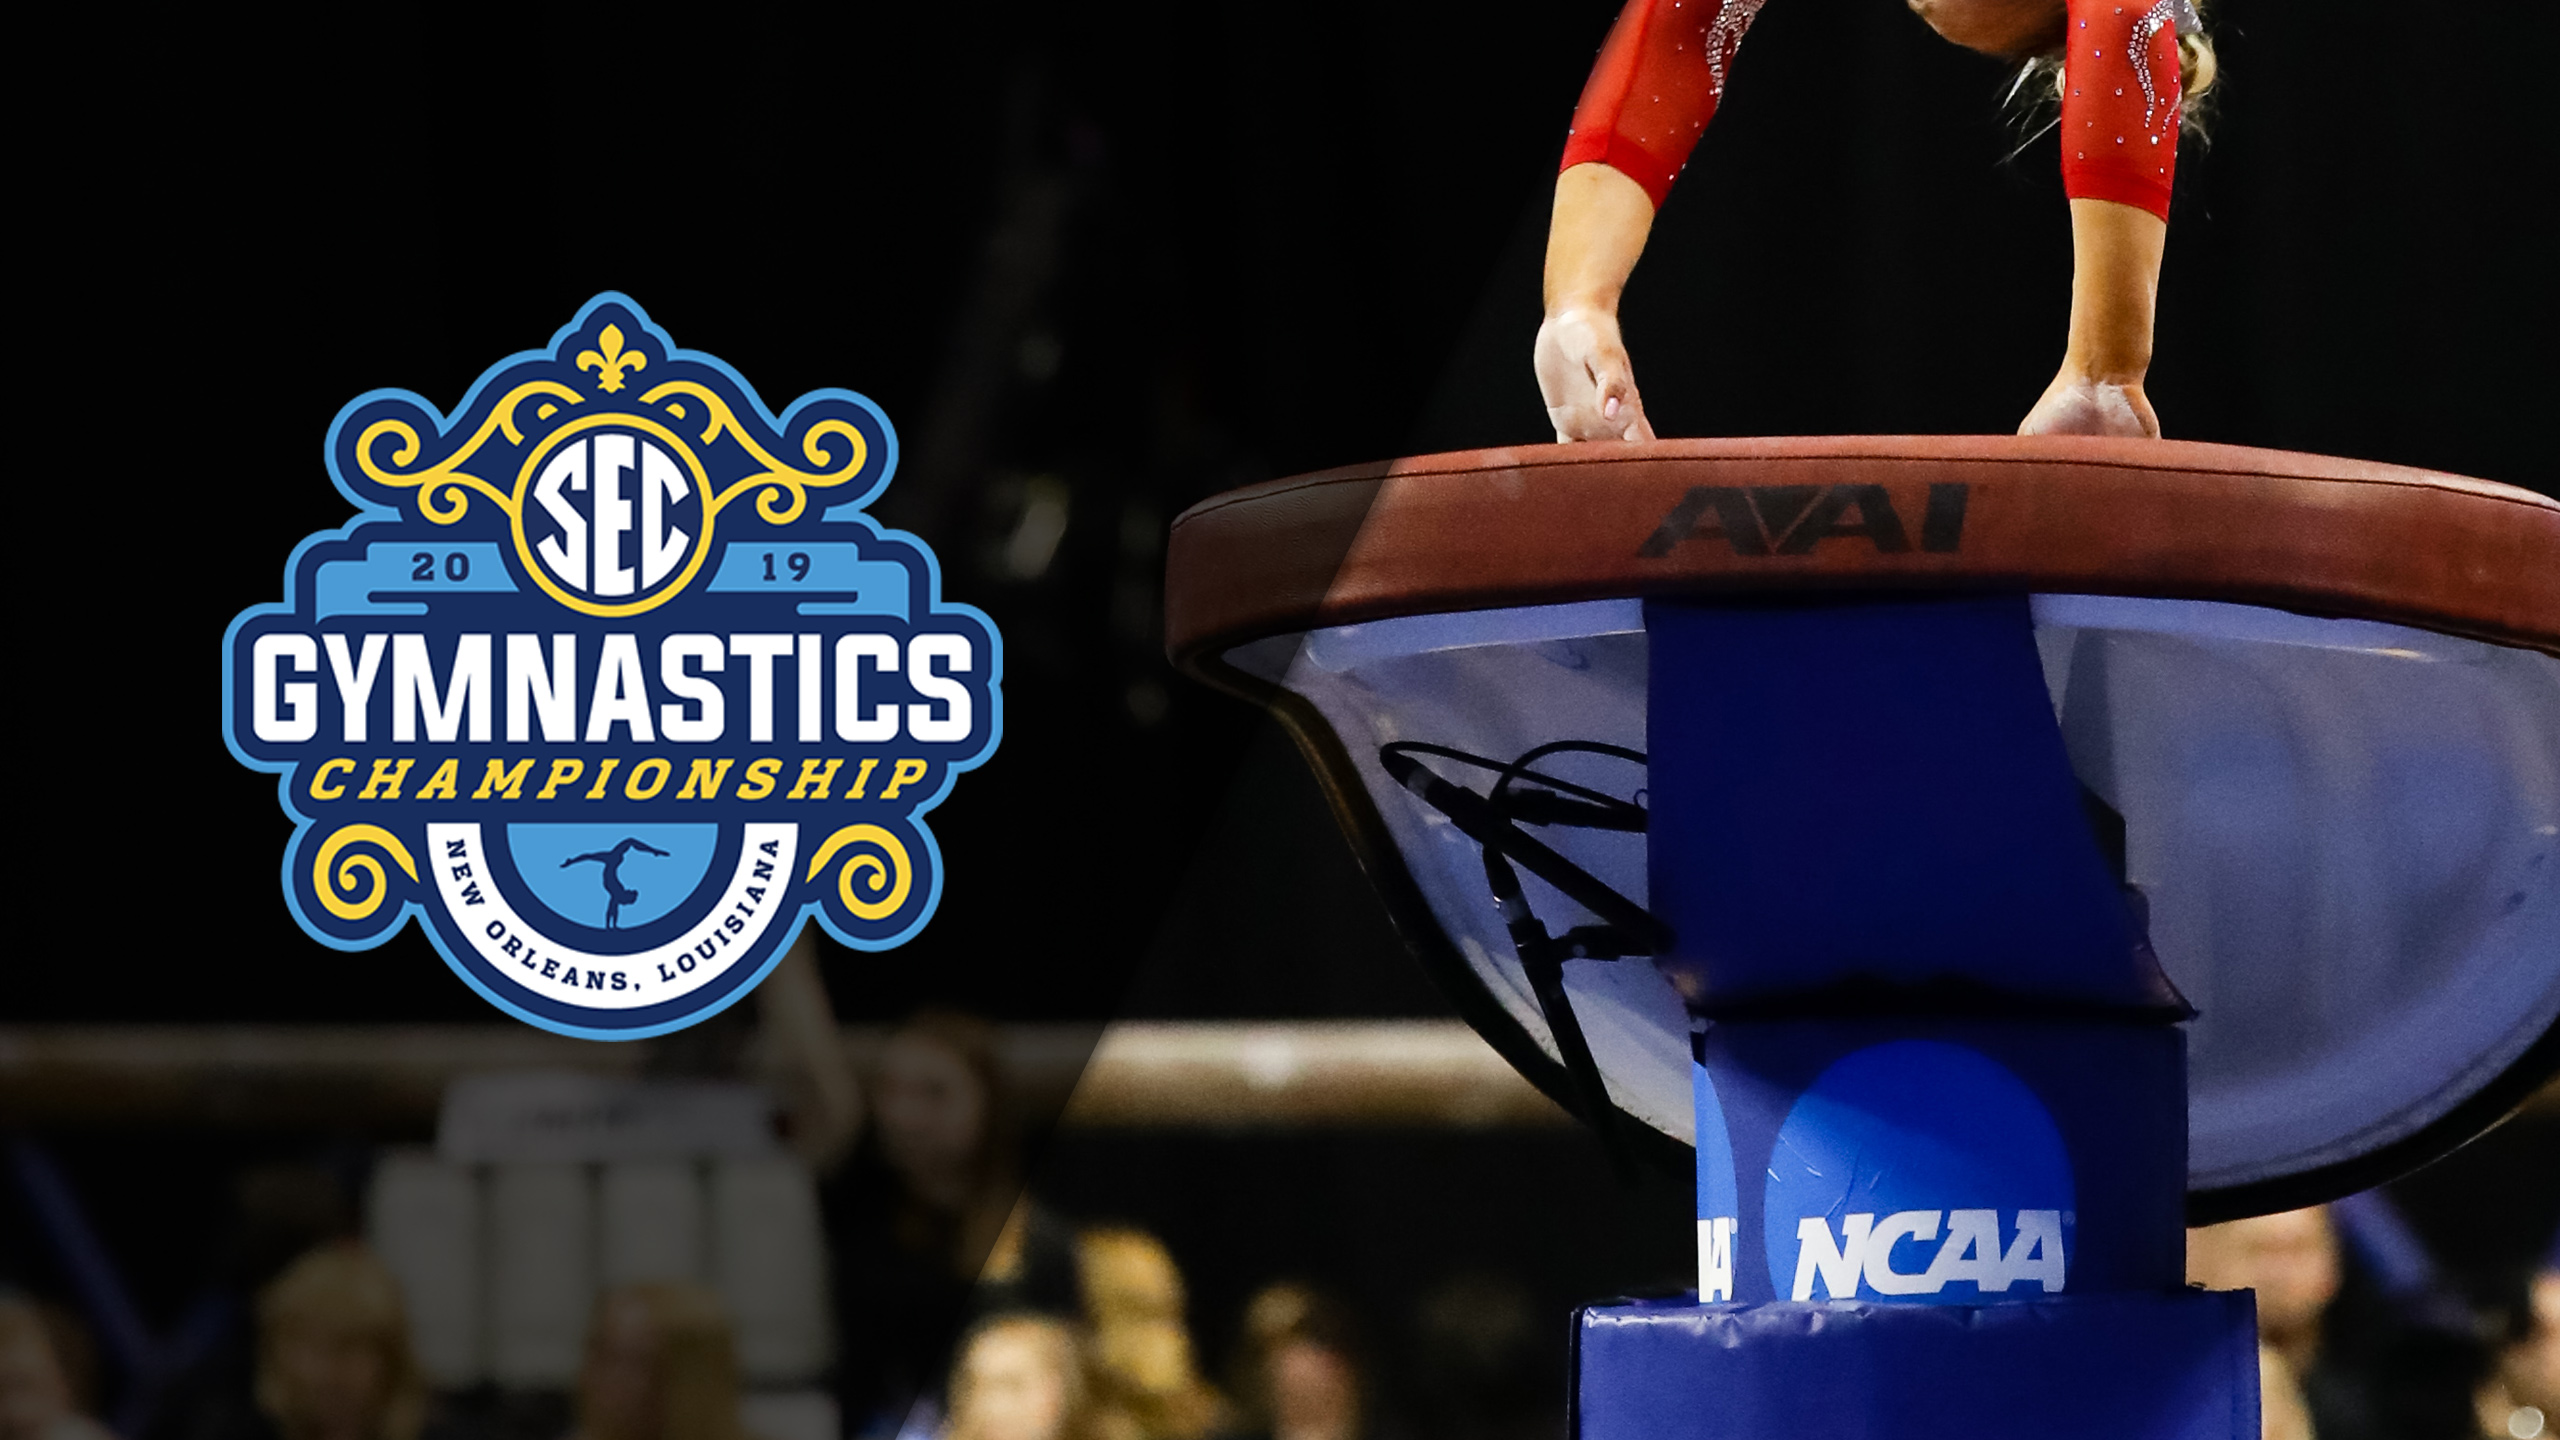 SEC Gymnastics Championship - Vault (Afternoon Session)